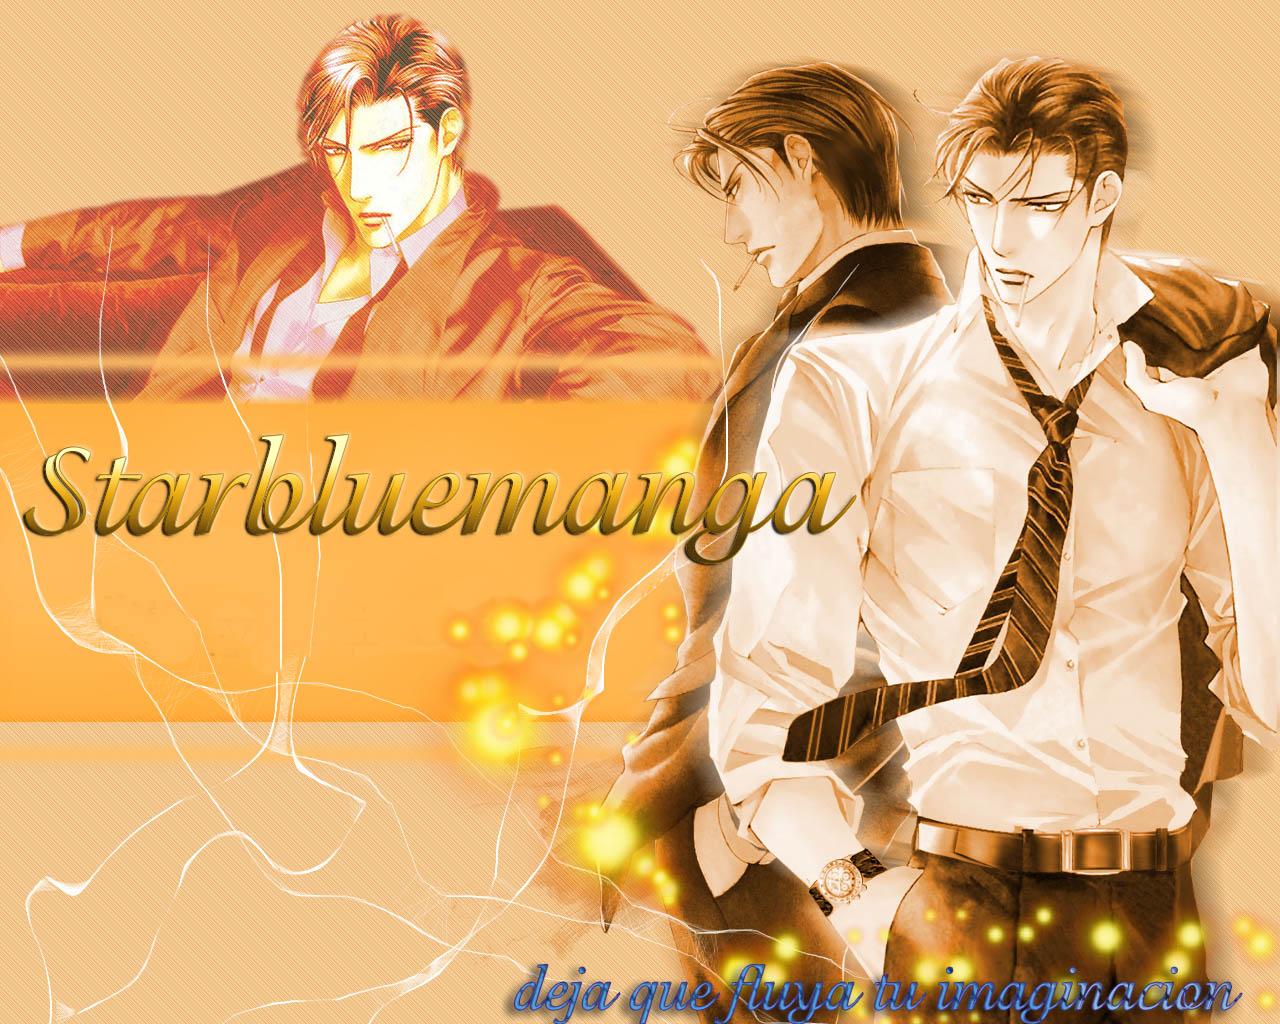 https://c5.mangatag.com/es_manga/21/17173/449510/874dc8c9cd9006d9aaca0cb5ac550812.jpg Page 1